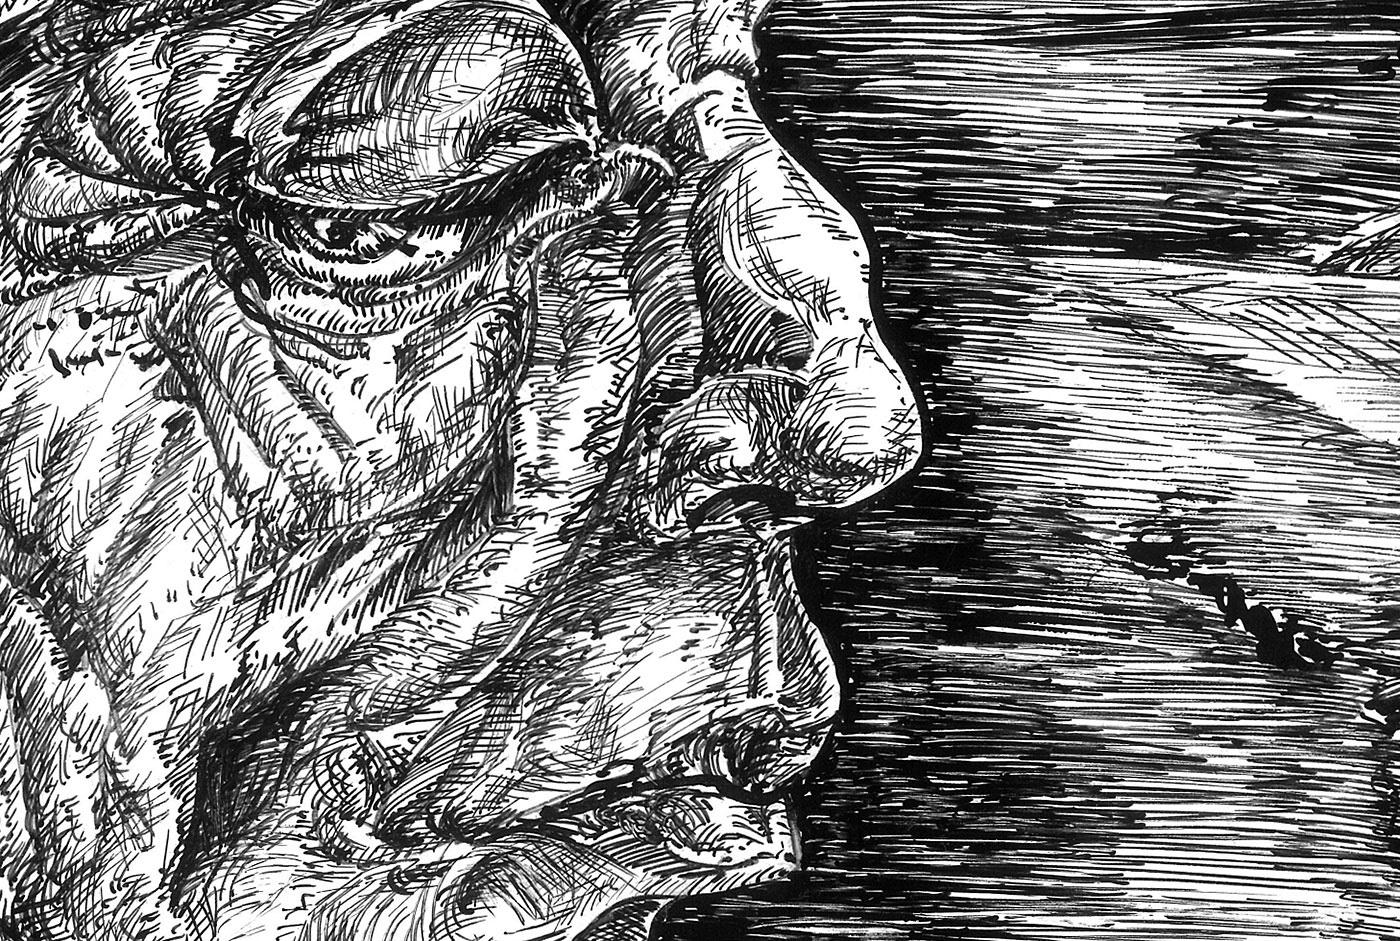 influence ink artwork invasion Emotional psychology philosophy  grotesque surrealism ILLUSTRATION